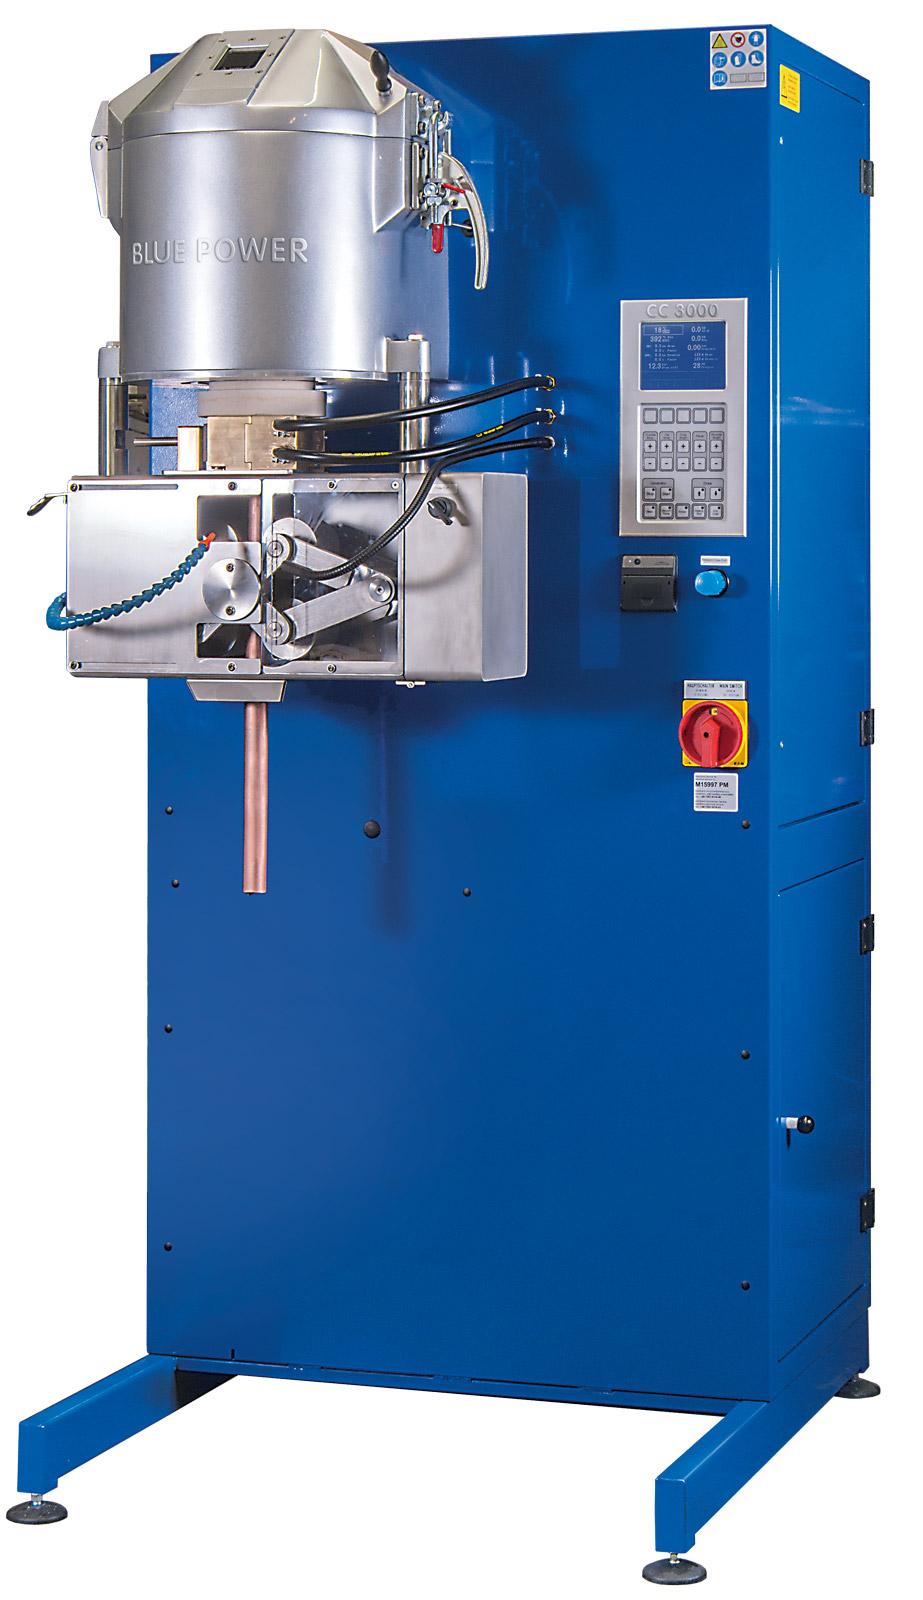 Stranggießanlage CC 3000 / VCC 3000 (Vakuum-Strangguss-Anlage)